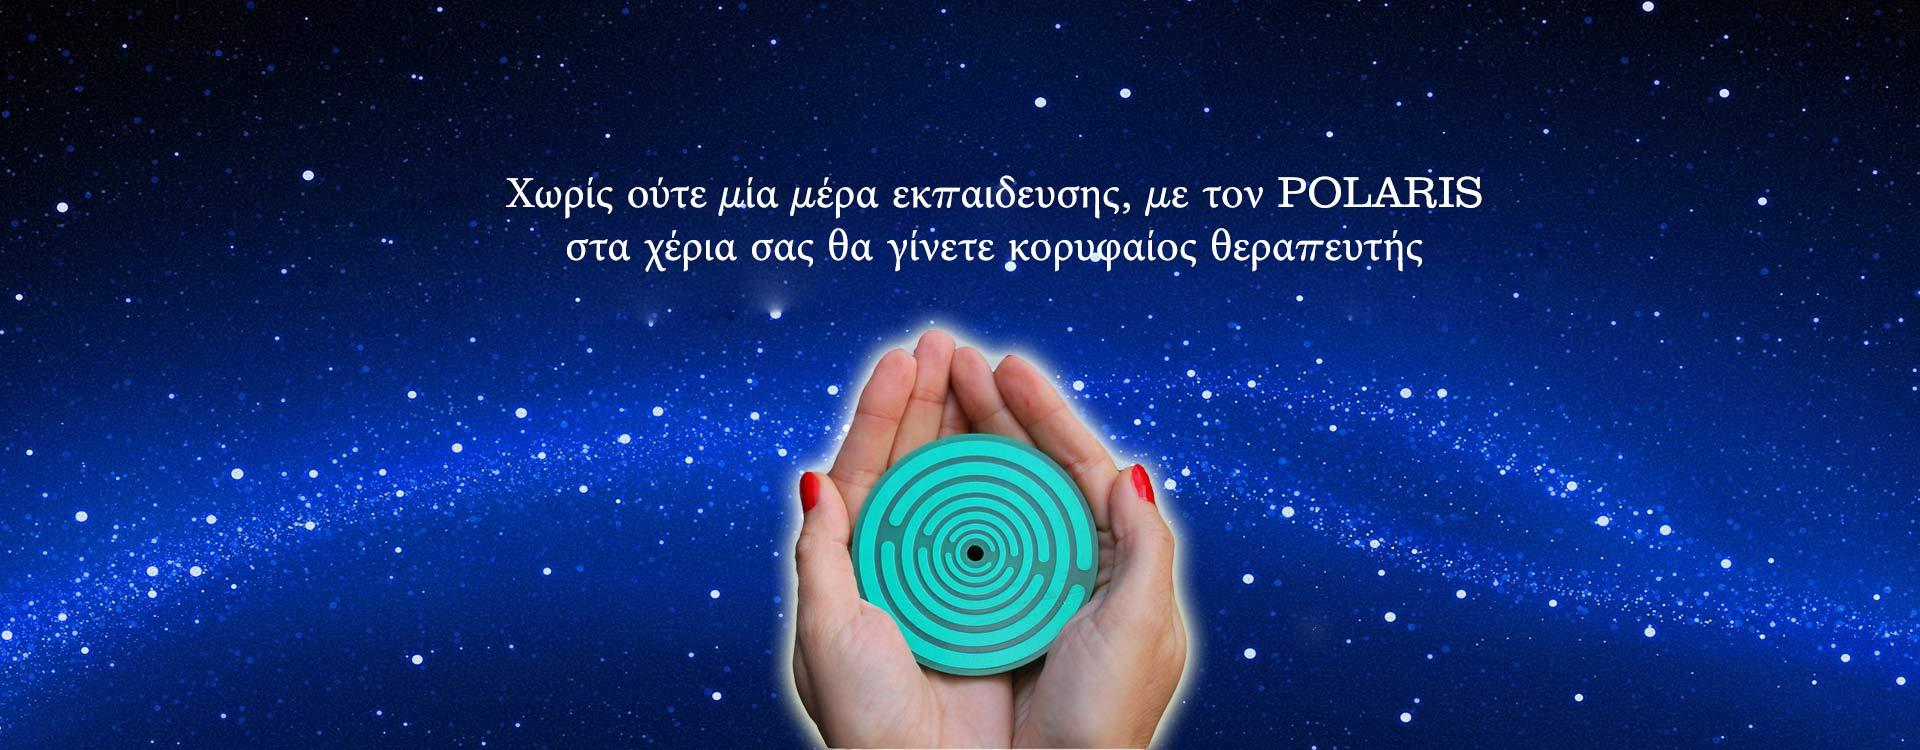 polaris diskos